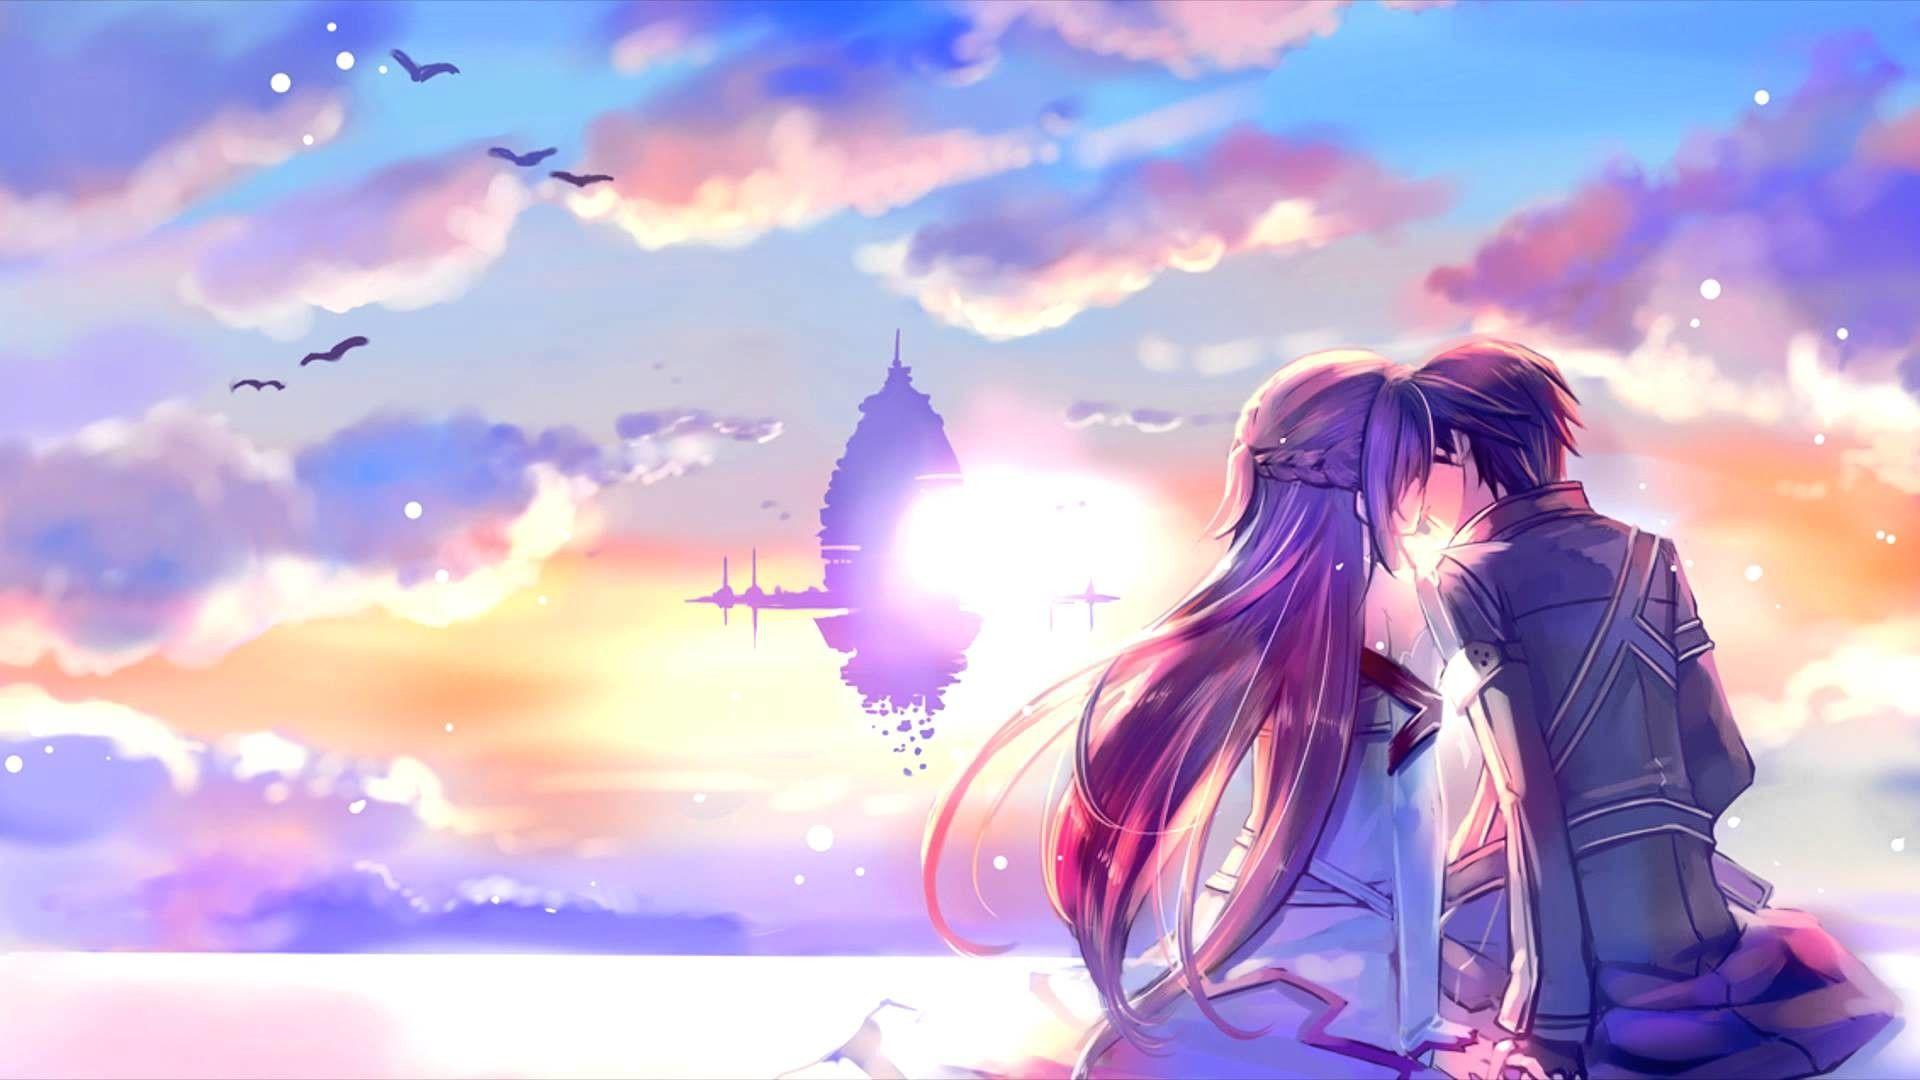 1920x1080 Romantic Asuna And Kirito Sword Art Online